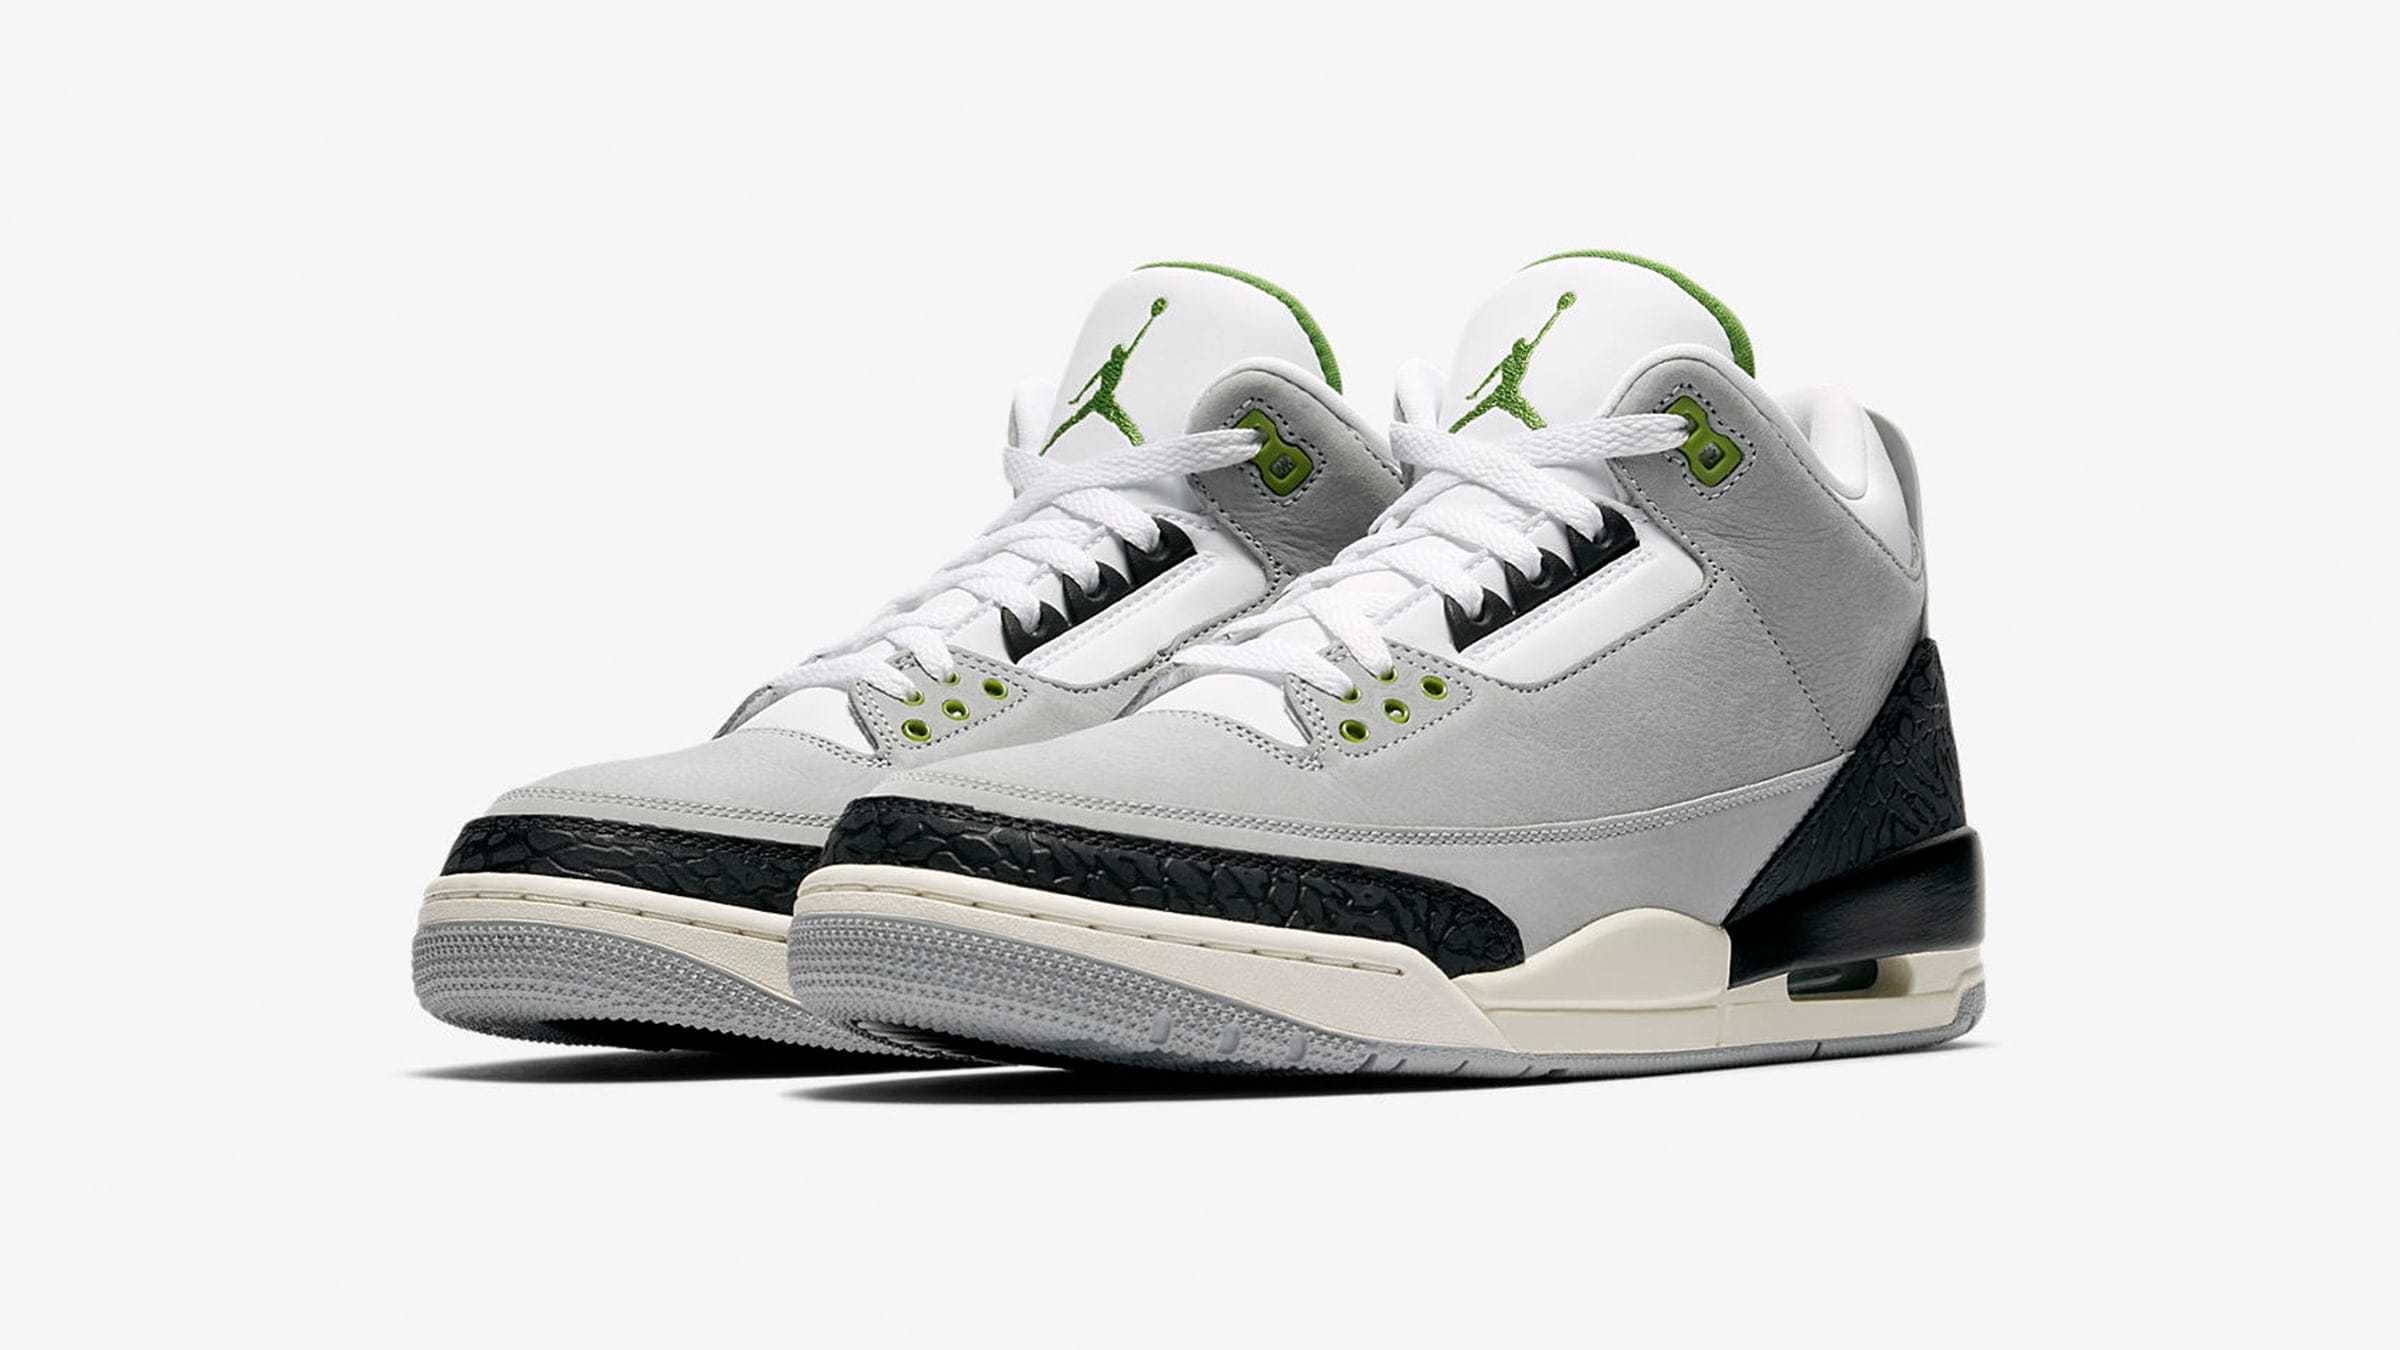 on sale new arrive biggest discount END. Features | Nike Air Jordan 3 'MJ x Tinker' - Register ...